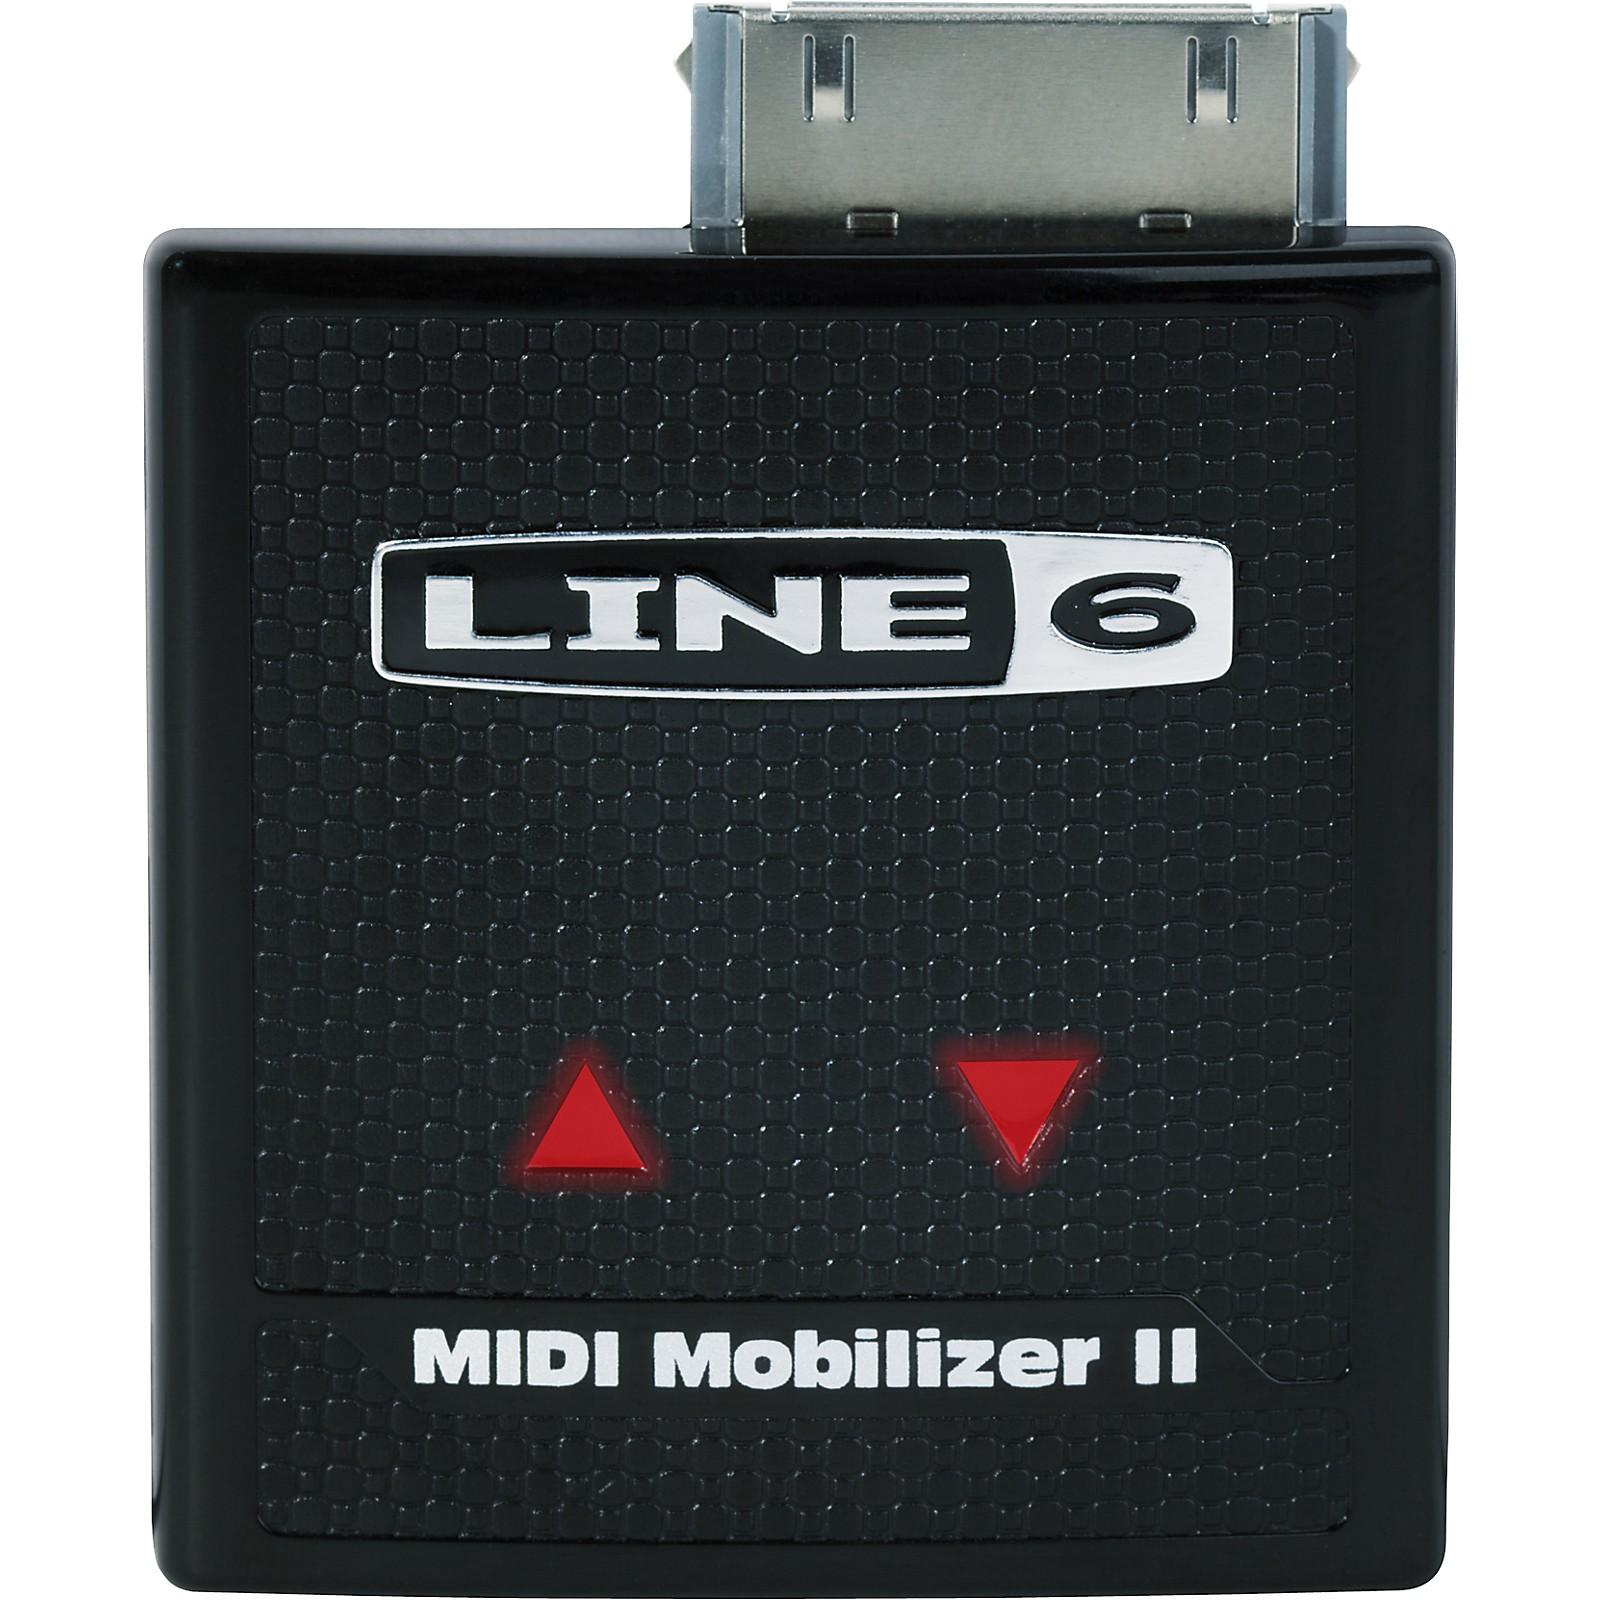 Line 6 MIDI Mobilizer II Portable Interface